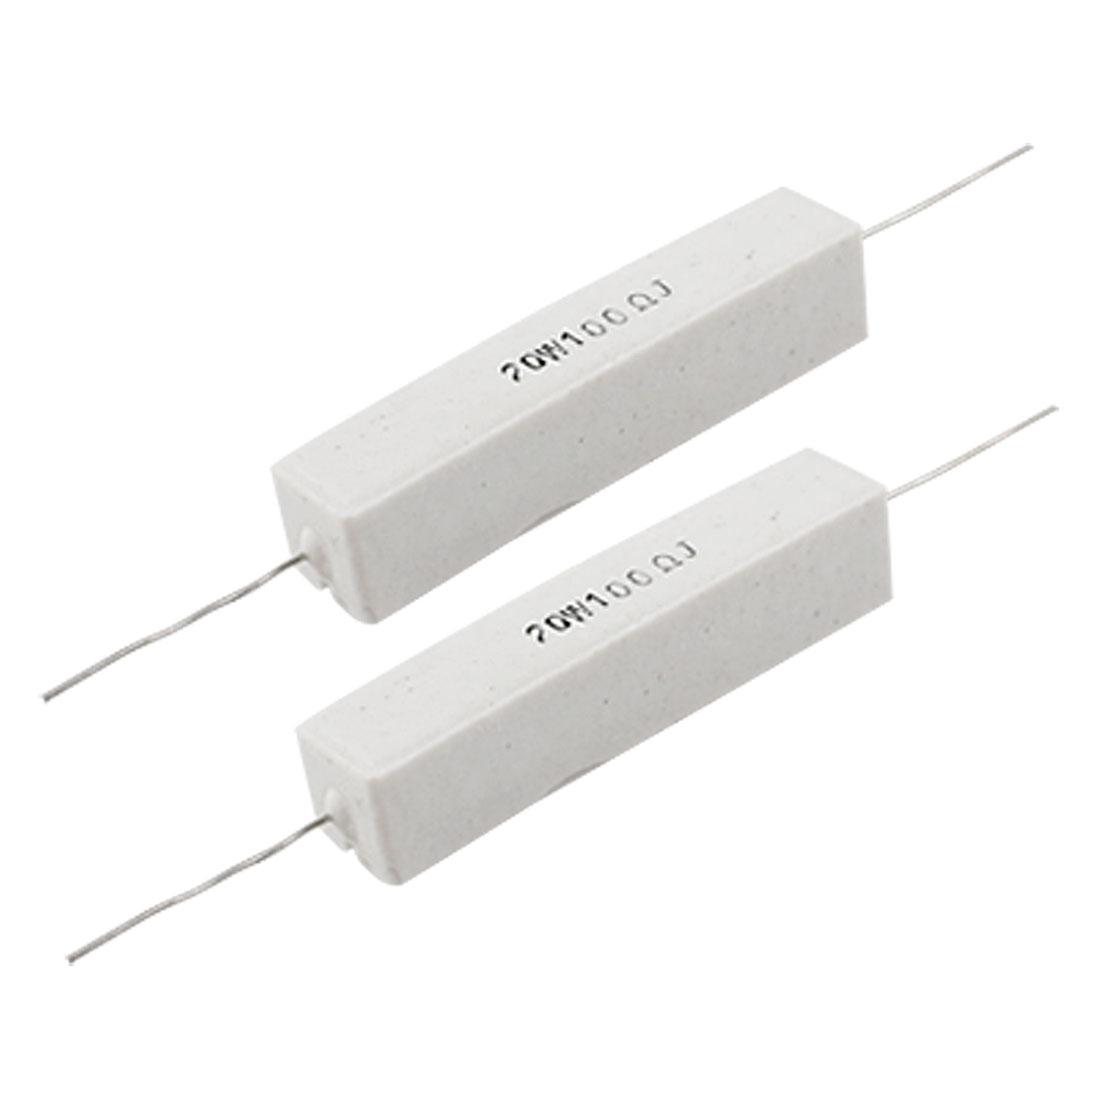 2 Pcs 5% 20W Watt 100 Ohm Wirewound Cement Power Resistors